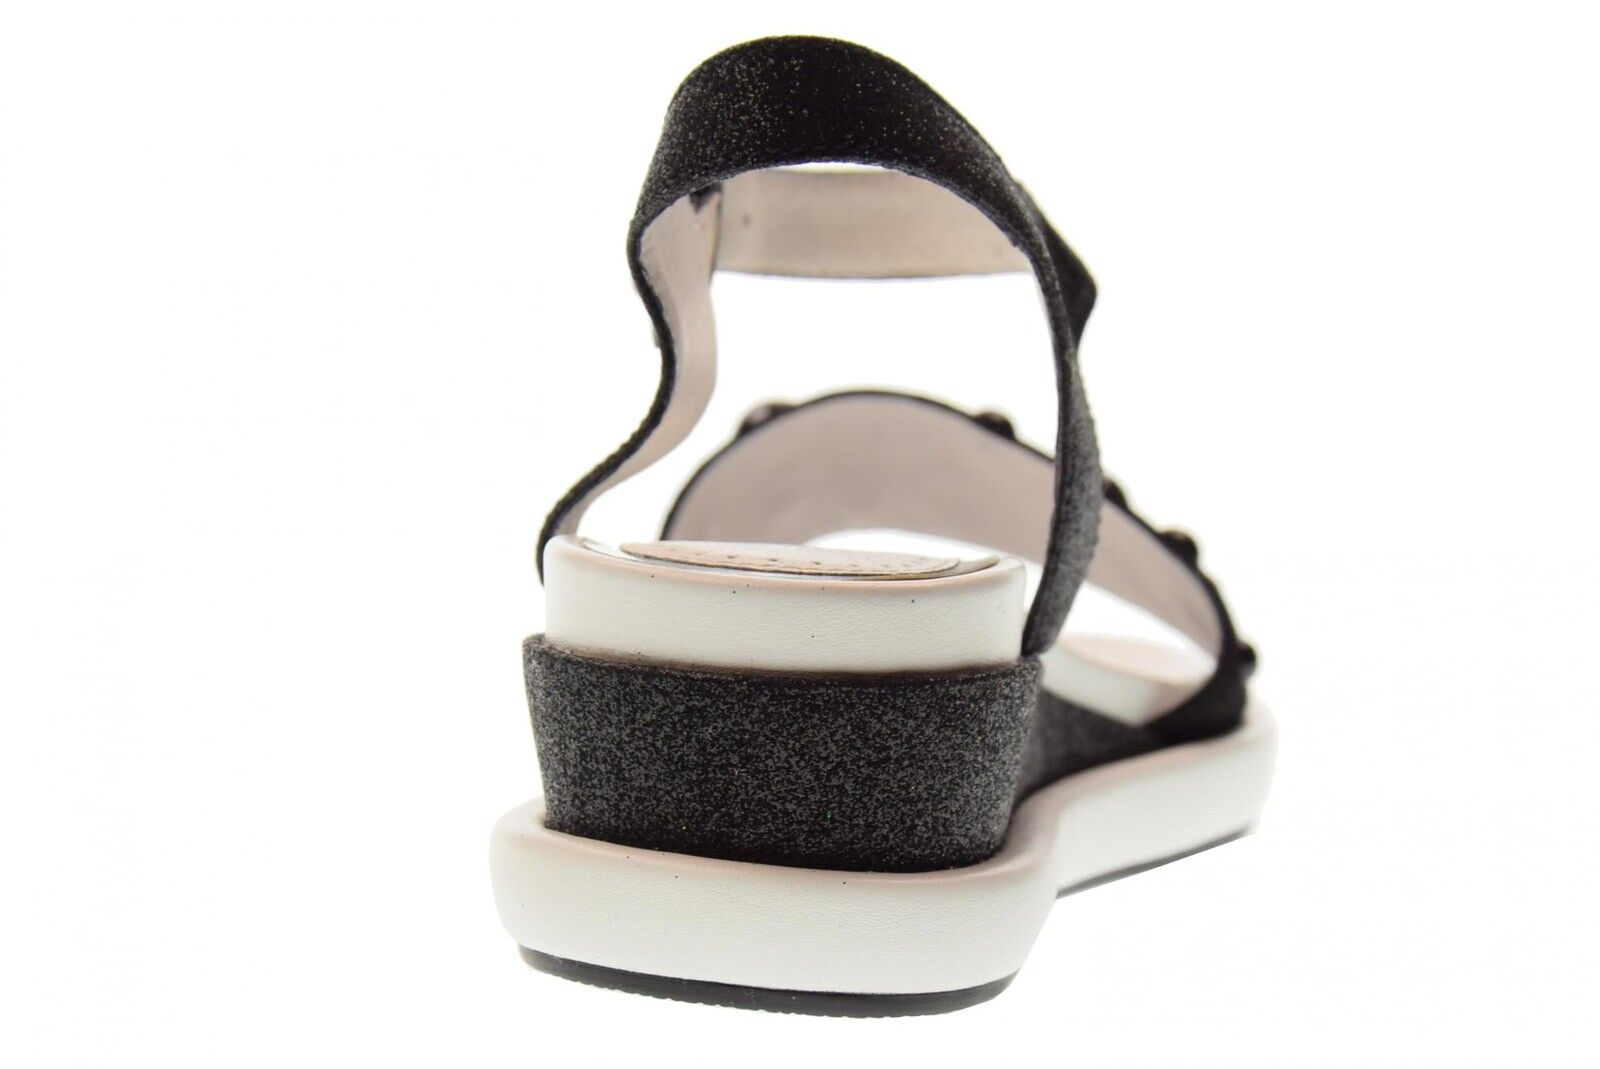 Descuento de liquidación Altraofficina scarpe donna sandali Q1302X NERO P18